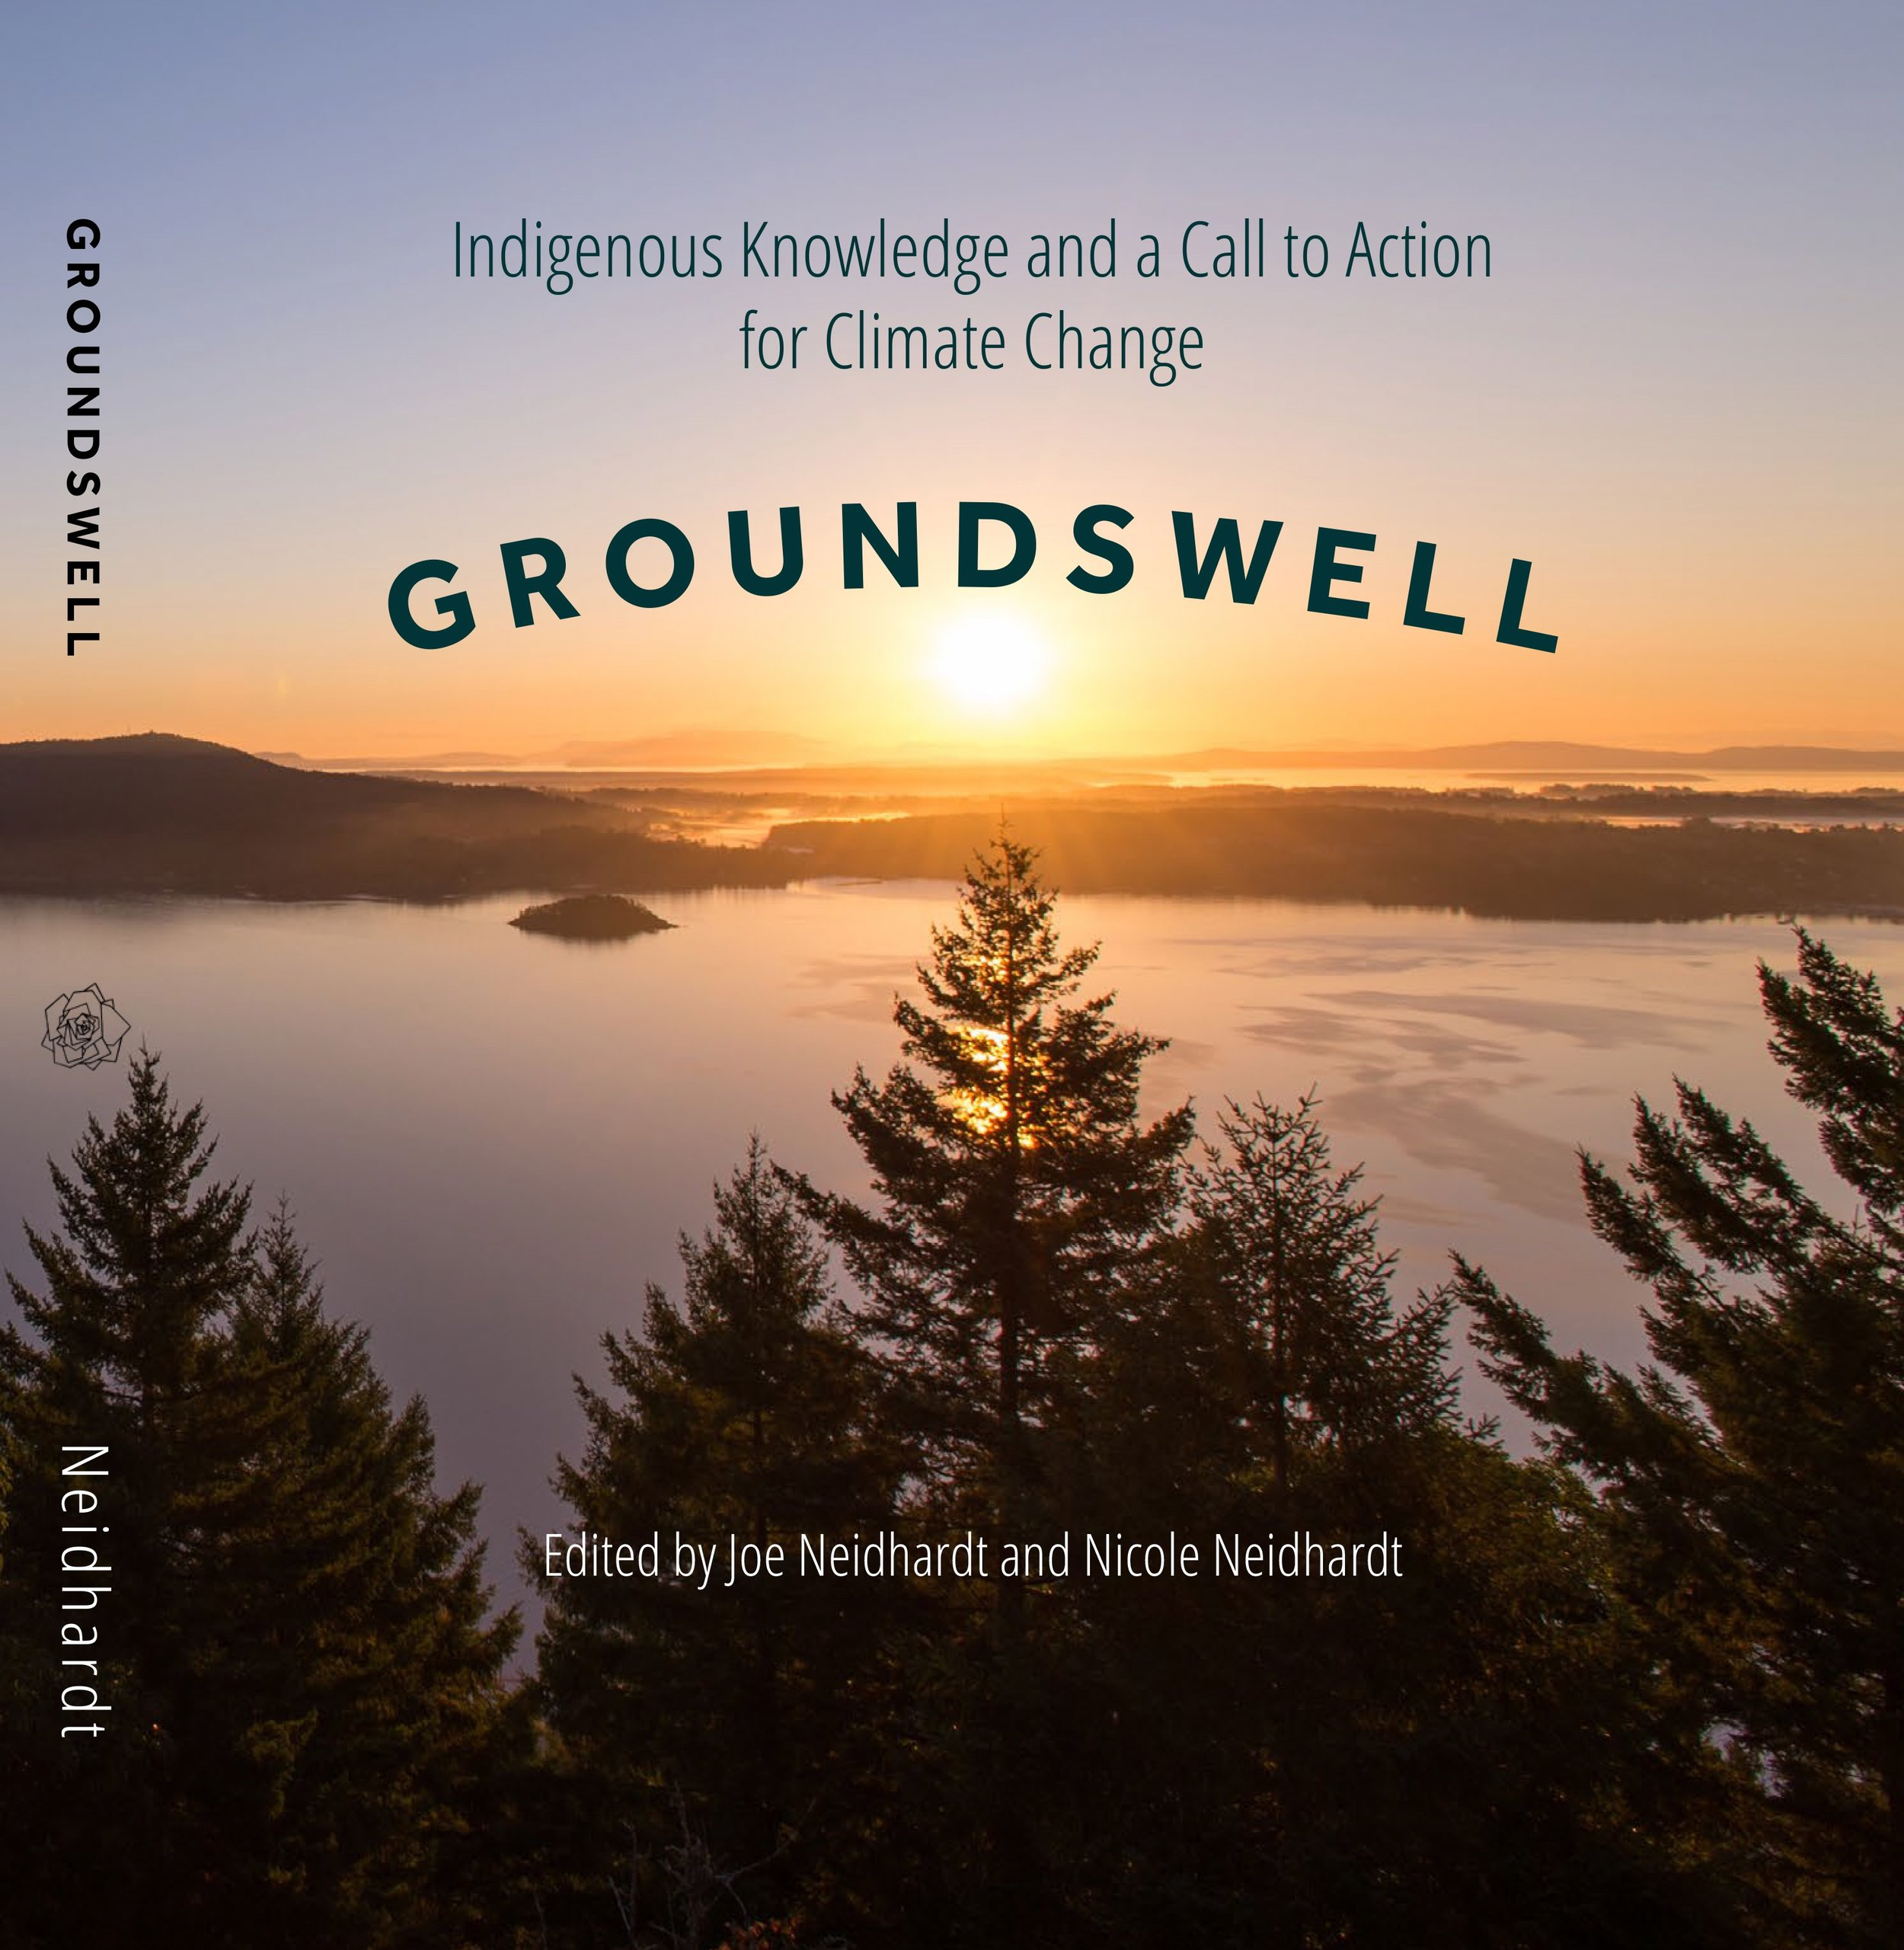 Groundswell - Hard Cover Design - web.jpg